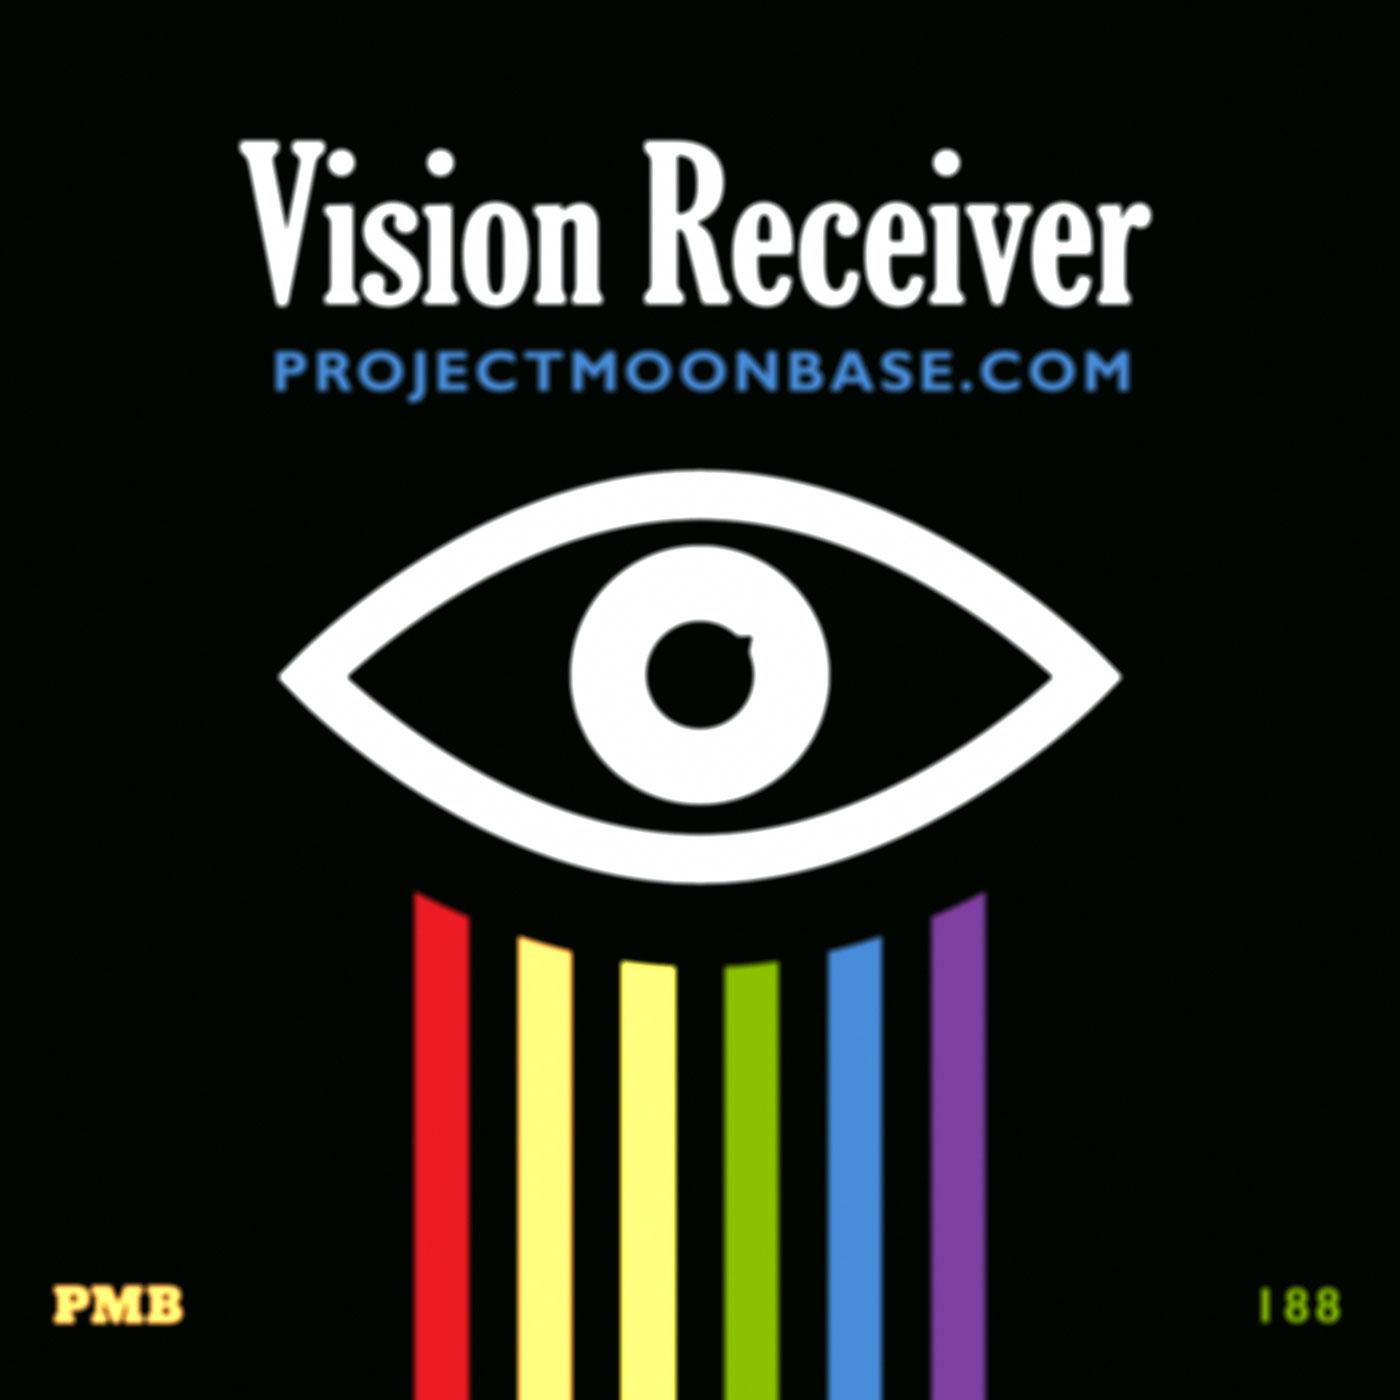 PMB188: Vision Receiver